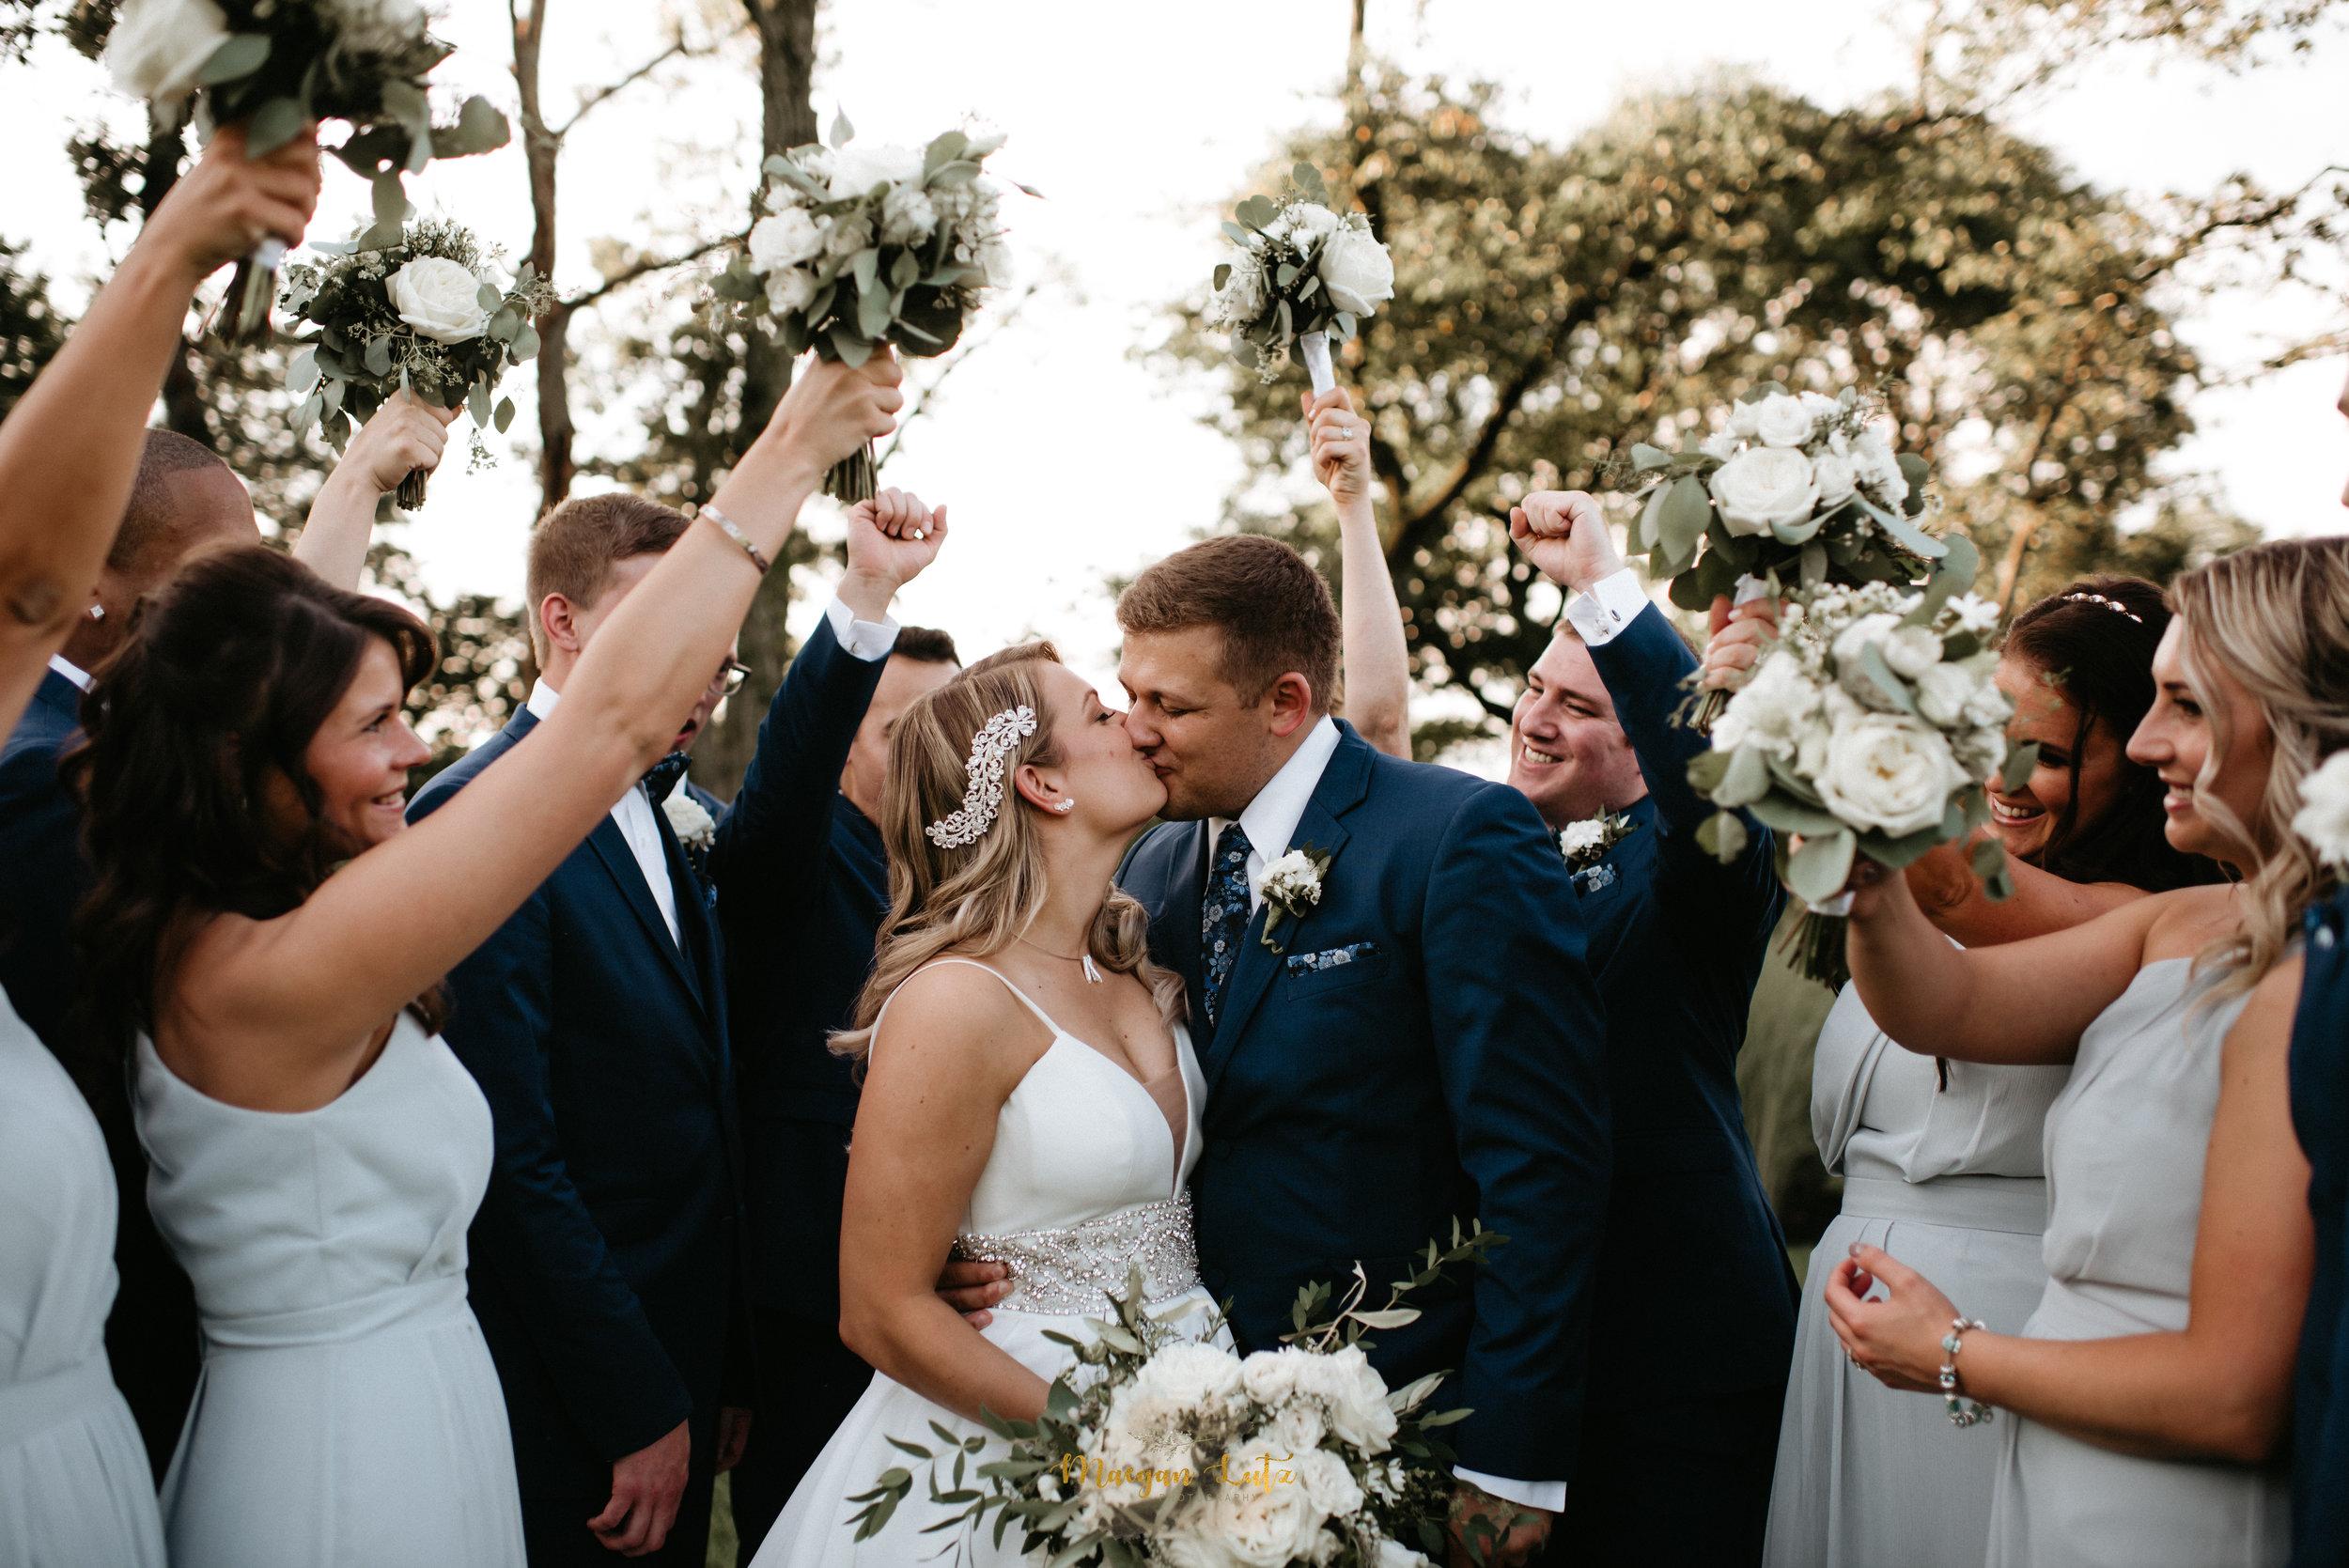 NEPA-Wedding-Photographer-Blue-Mountain-Ski-Resort-Maegan-Lutz-Photography-33.jpg